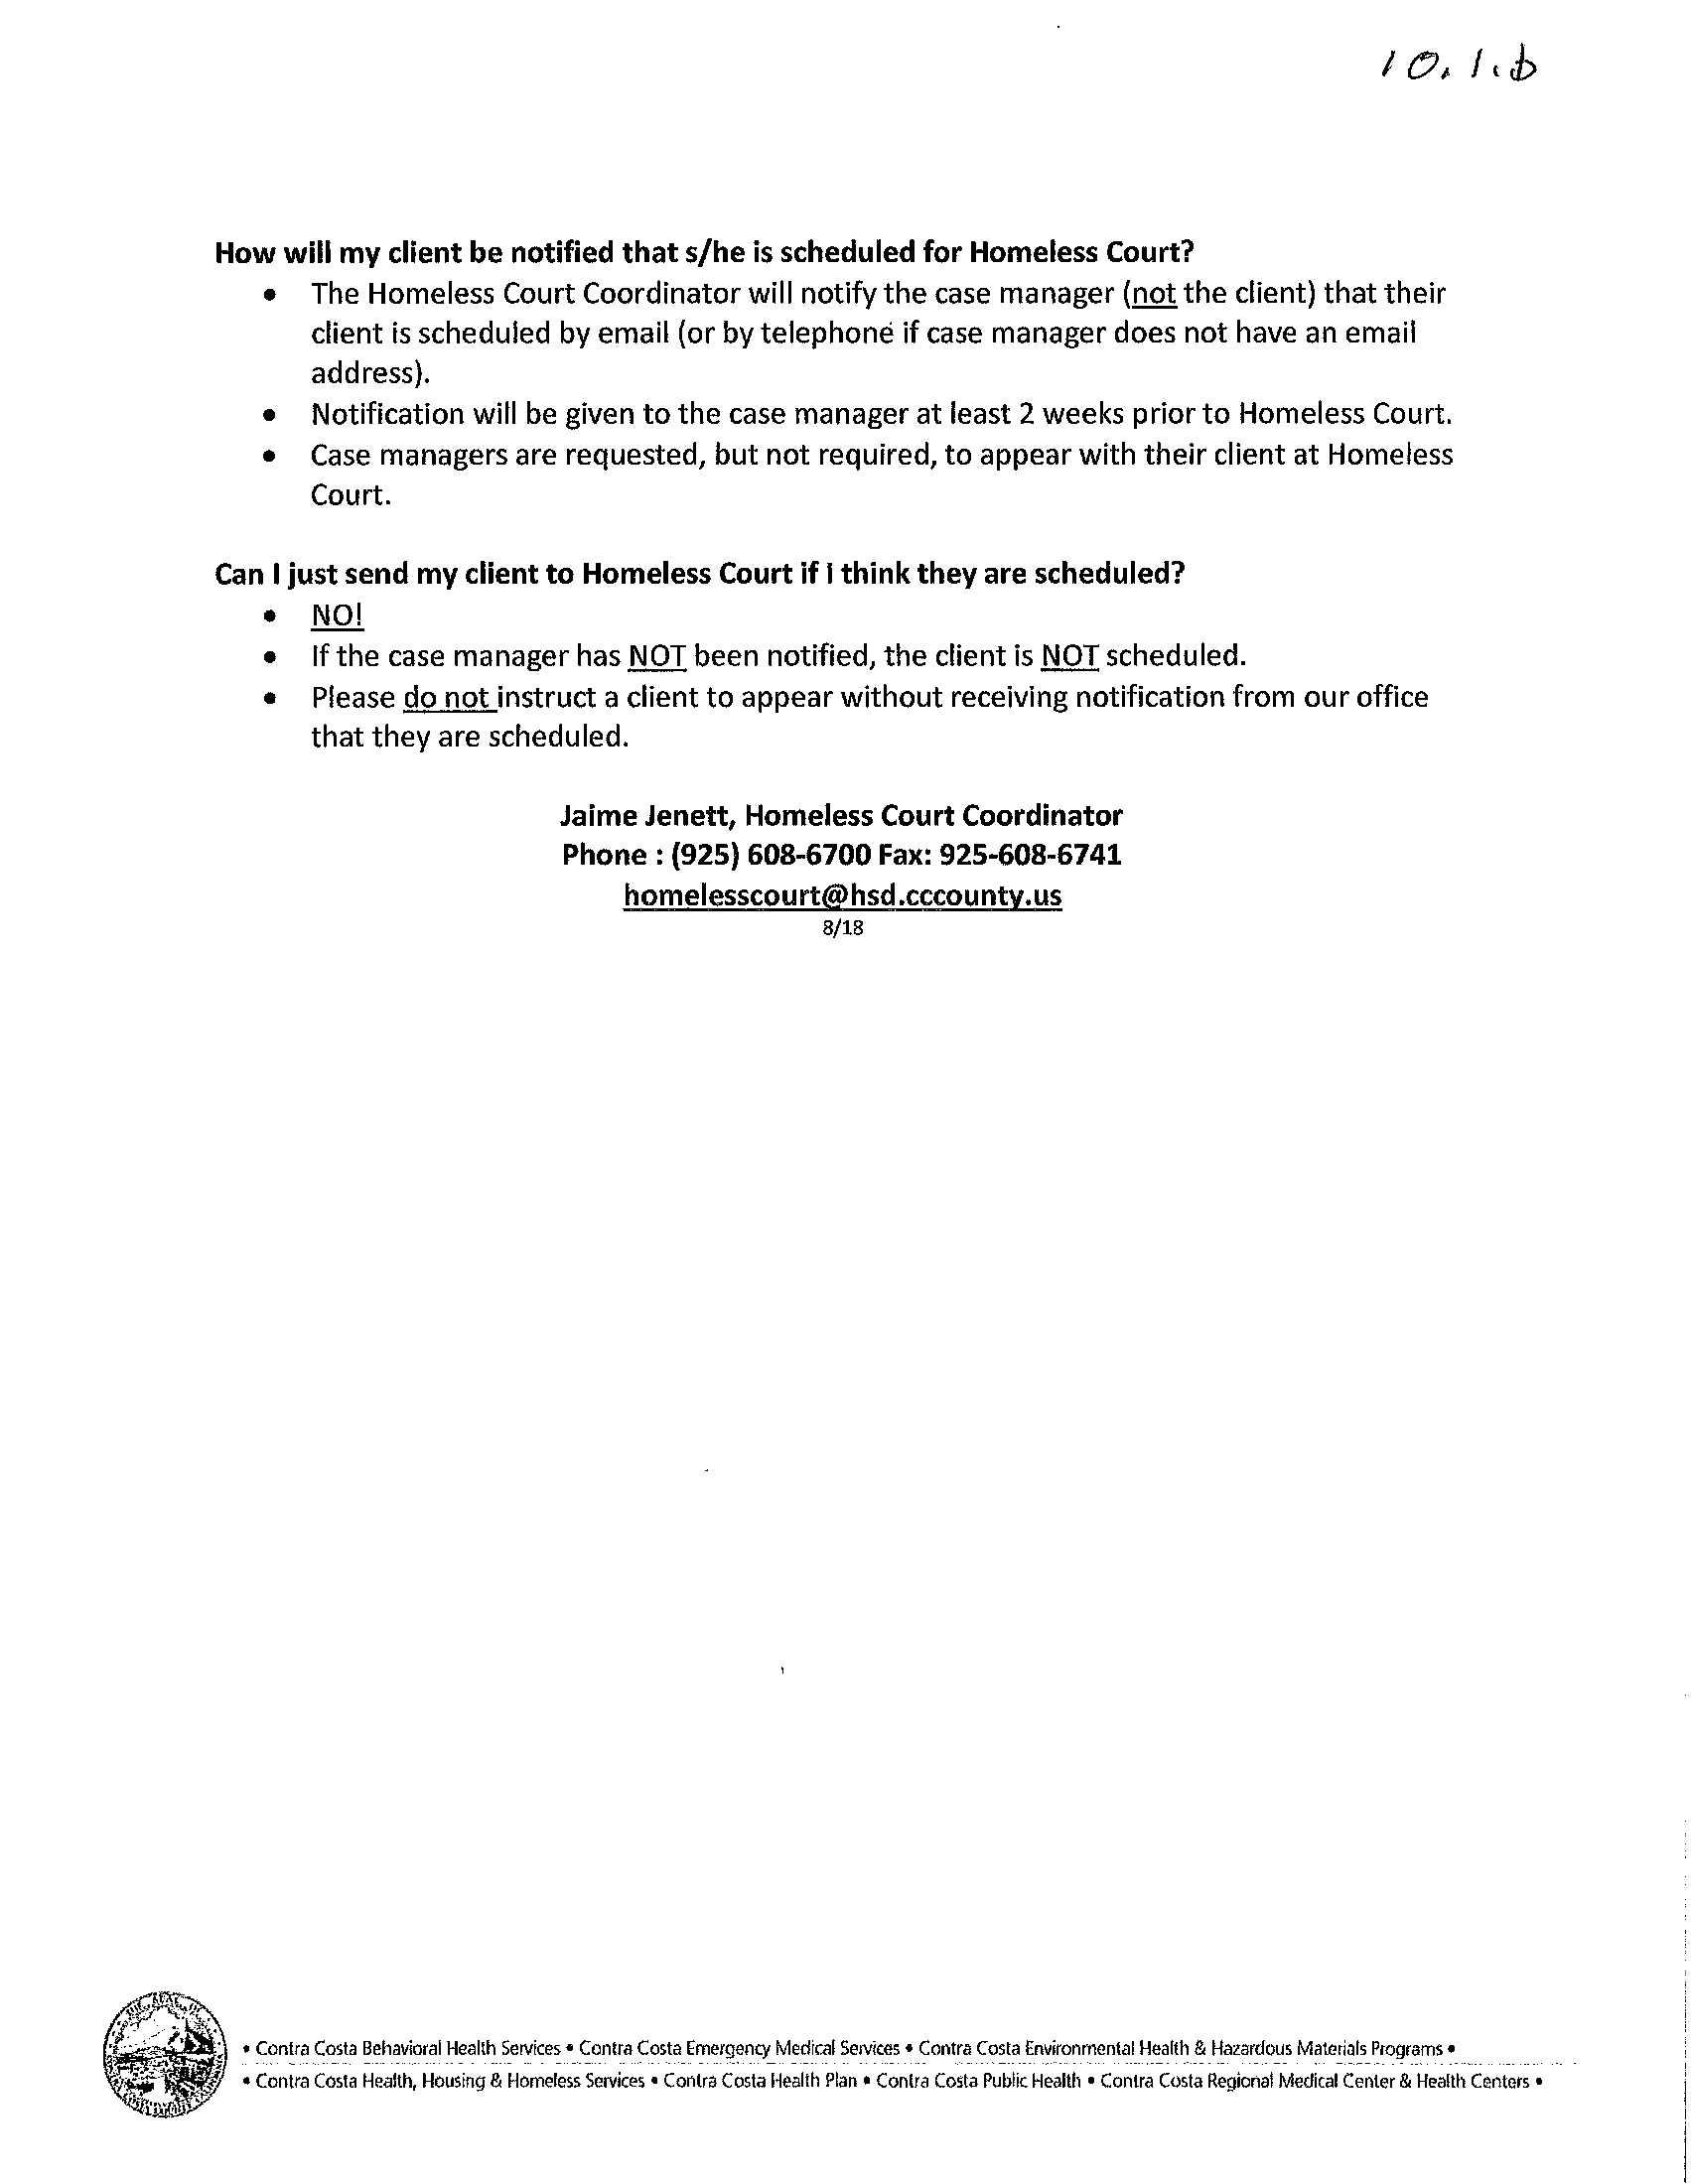 ESMAC Agenda 09.12.2018 (22 Pages)_9.jpg